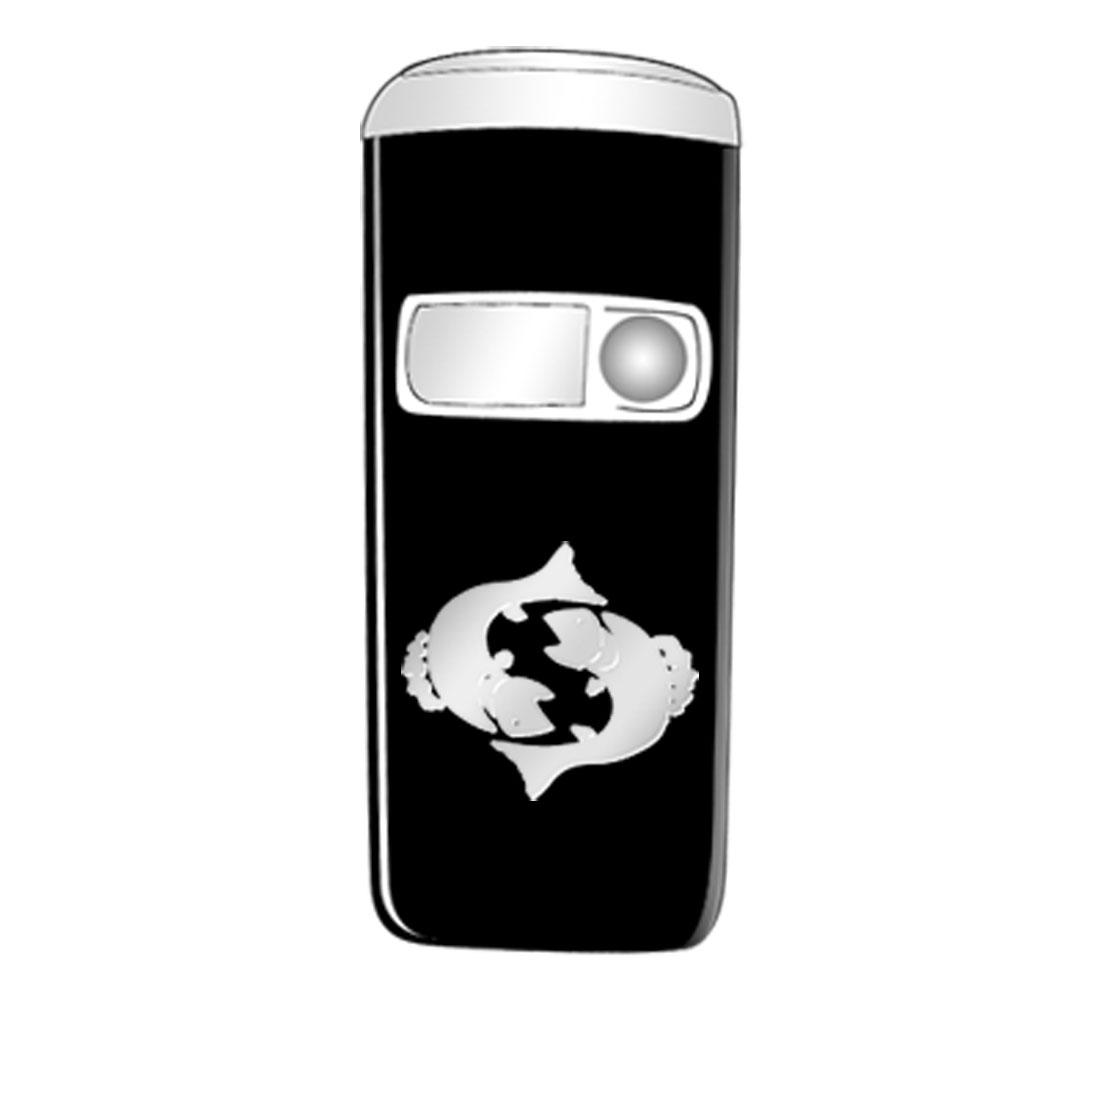 Metallic Mobile Phone Sticker - Pisces